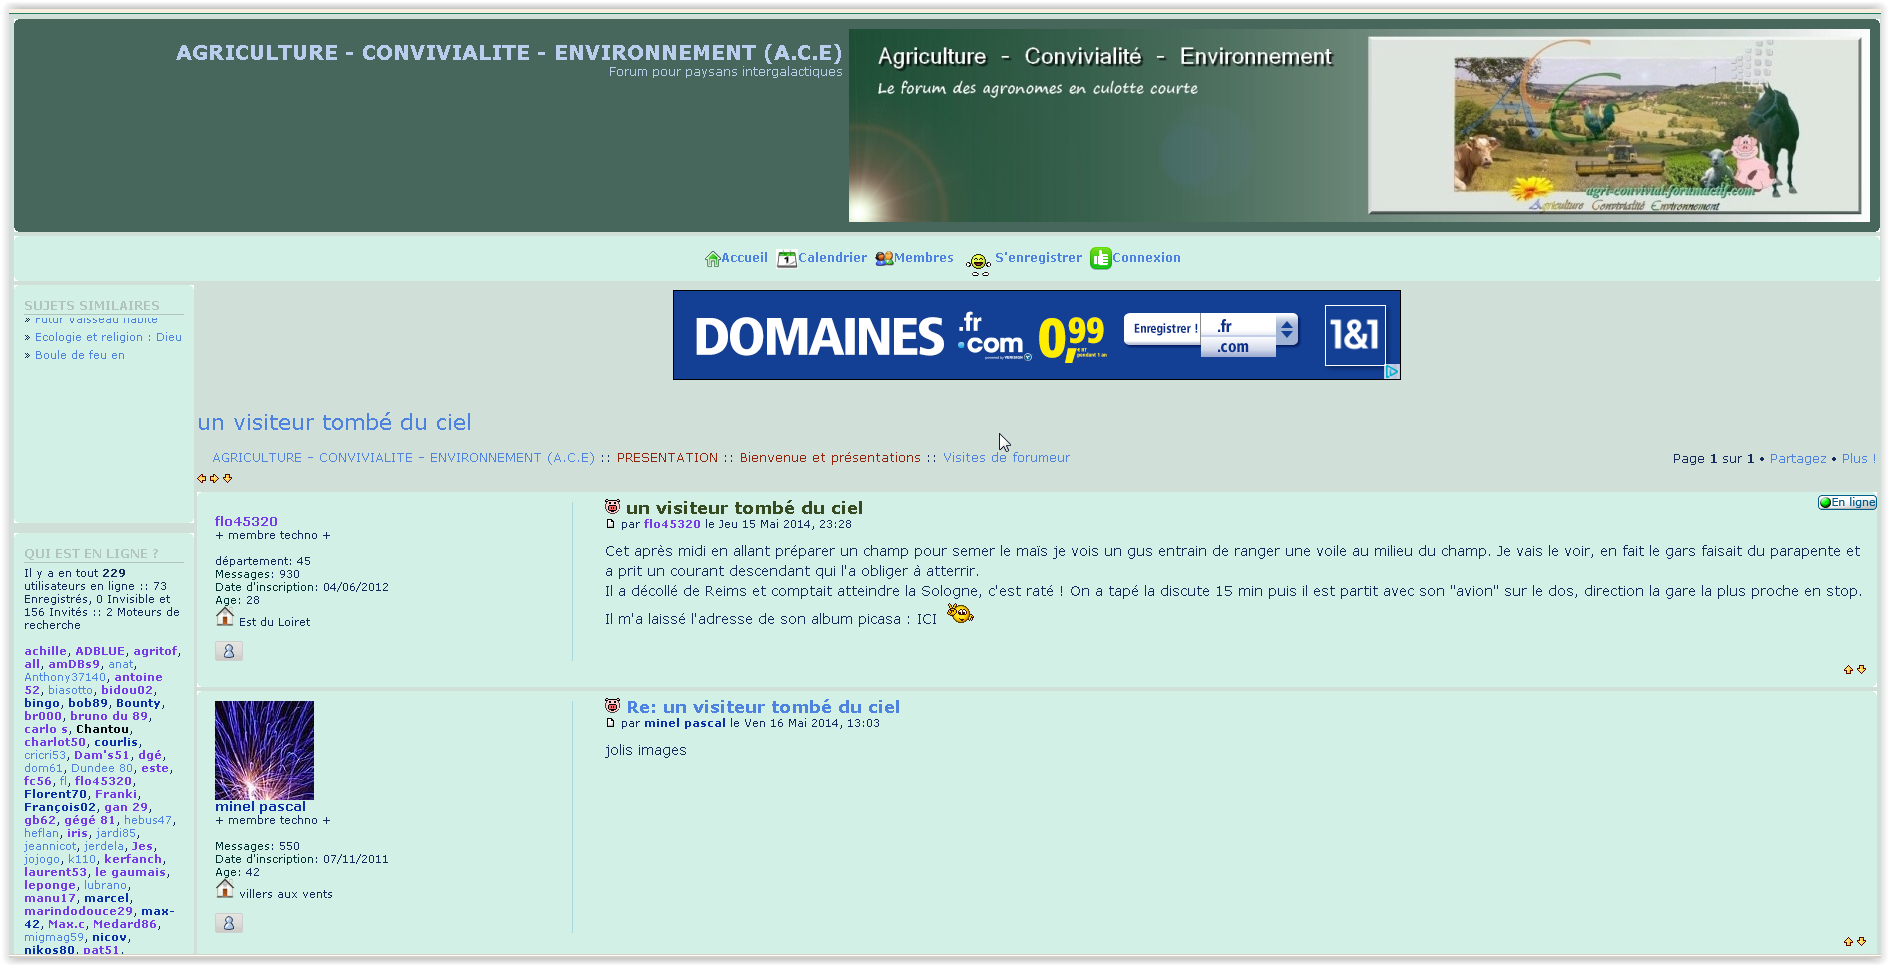 Forum www.agri-convivial.com/